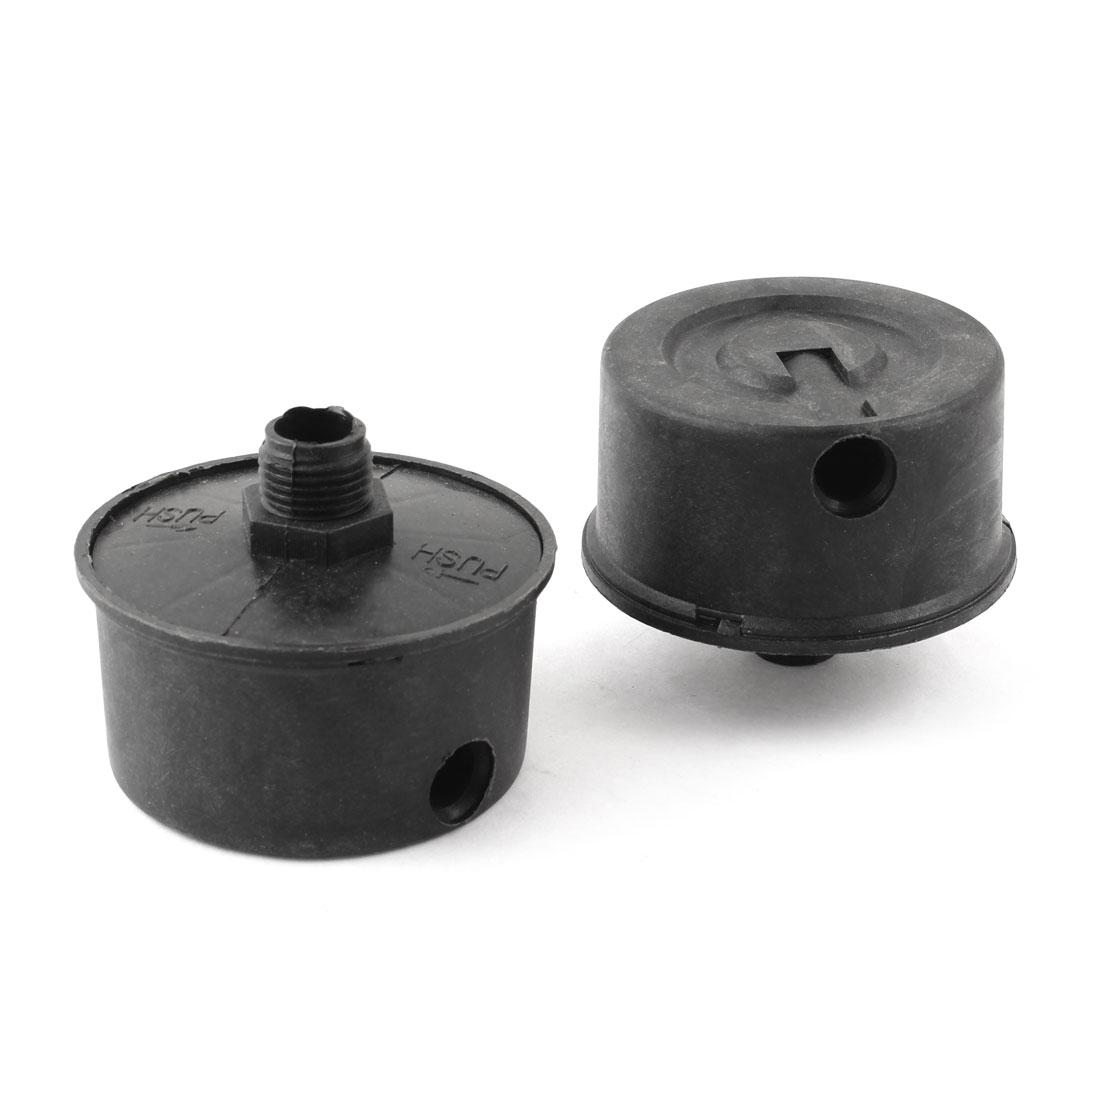 2 Pcs 16mm Thread Admitting Port Silencer Muffler Black for Air Compressor